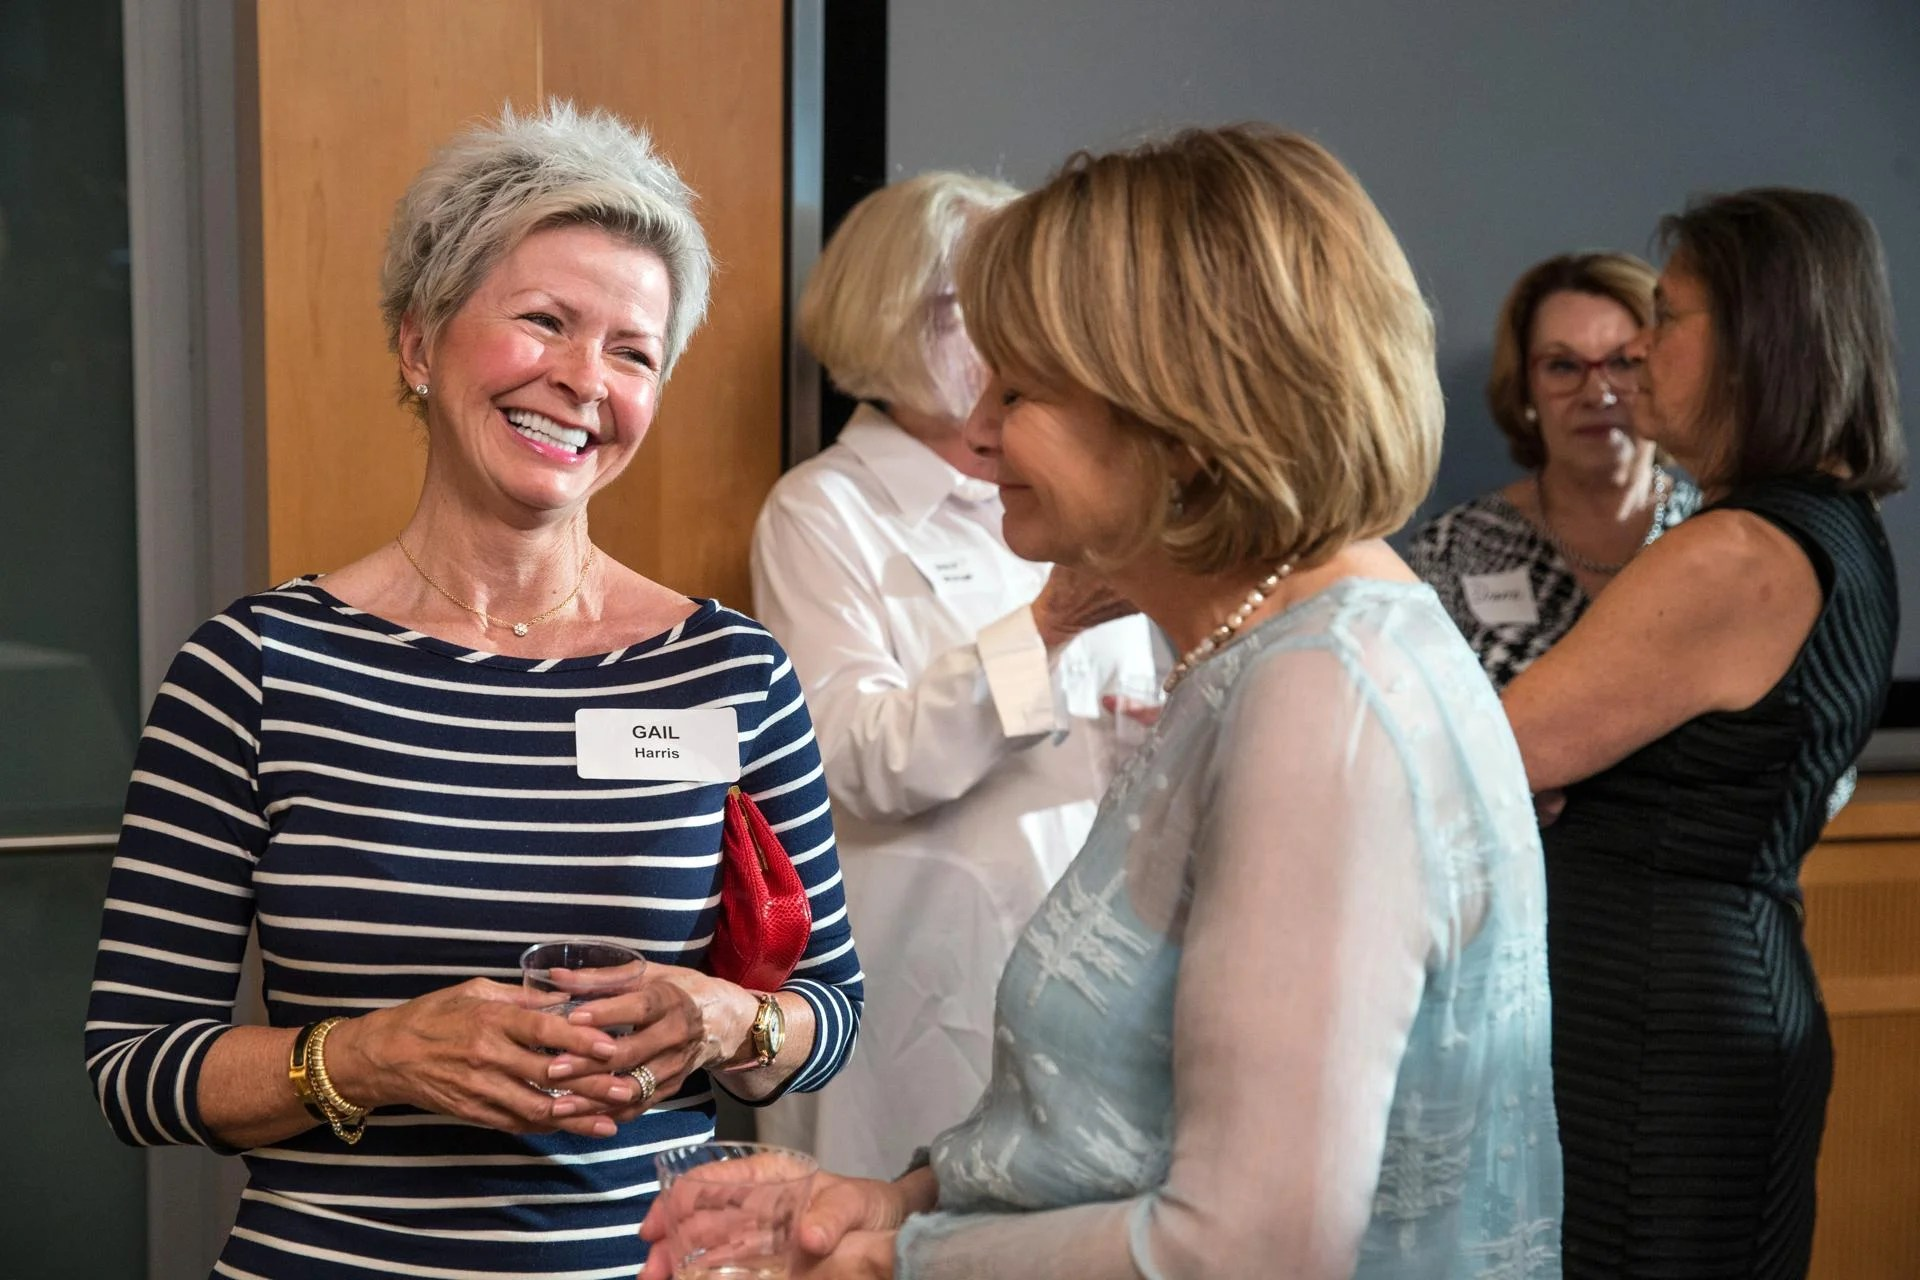 06/14/2017 BOSTON, MA Gail harris (cq) (left) and Francine Achbar (cq) attend a cocktail party at WGBH studios. (Aram Boghosian for The Boston Globe)